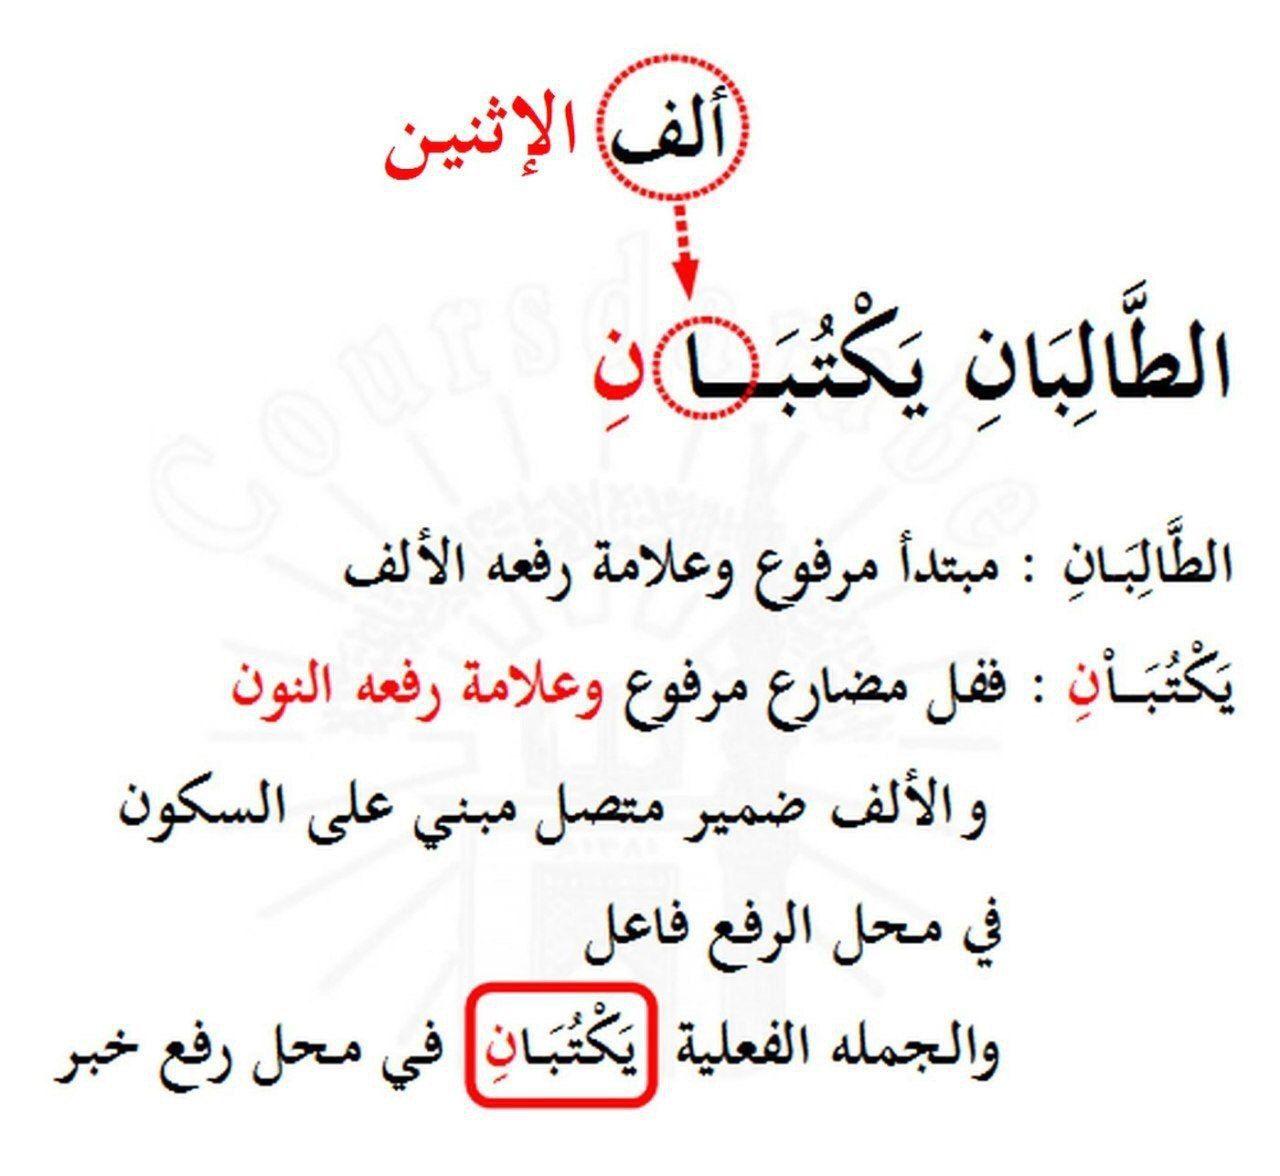 إعراب ألف الإثنين Arabic Language Language Arabic